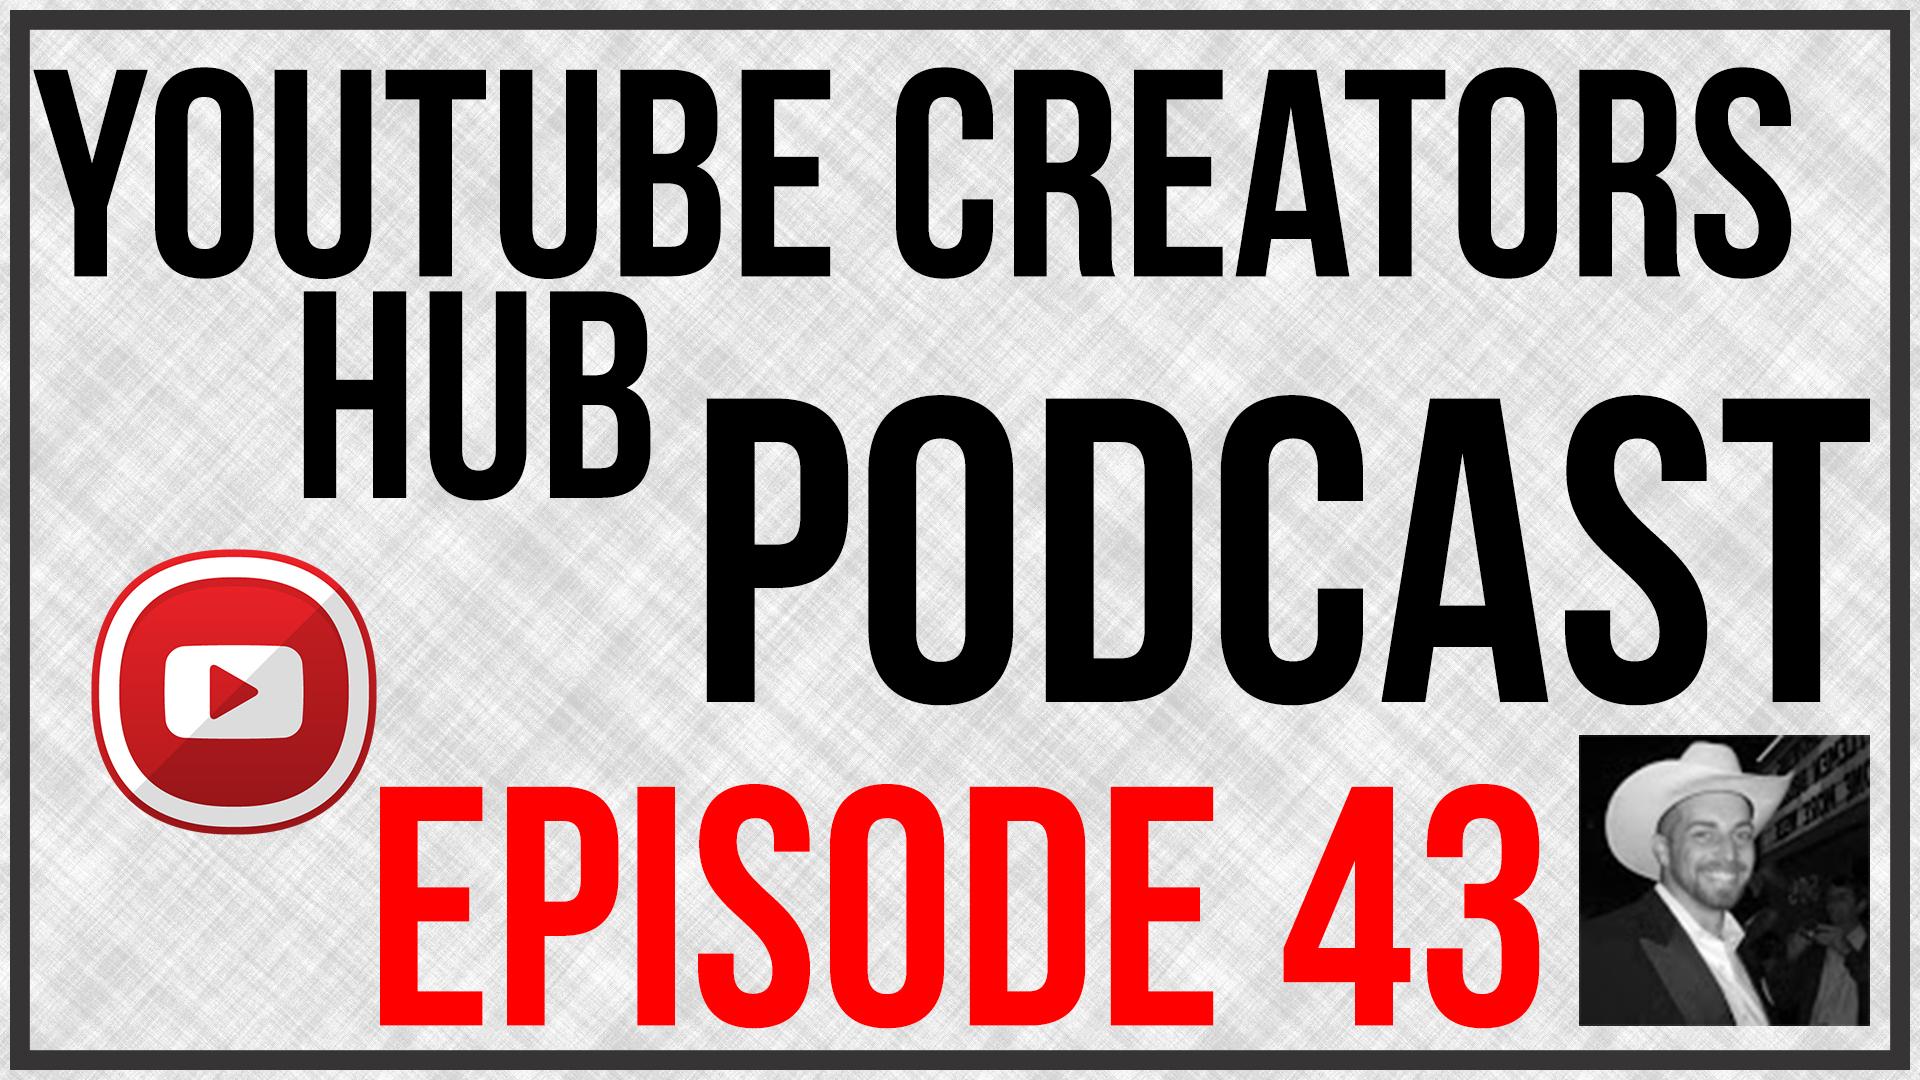 YouTube Creators Hub Podcast Episode 43